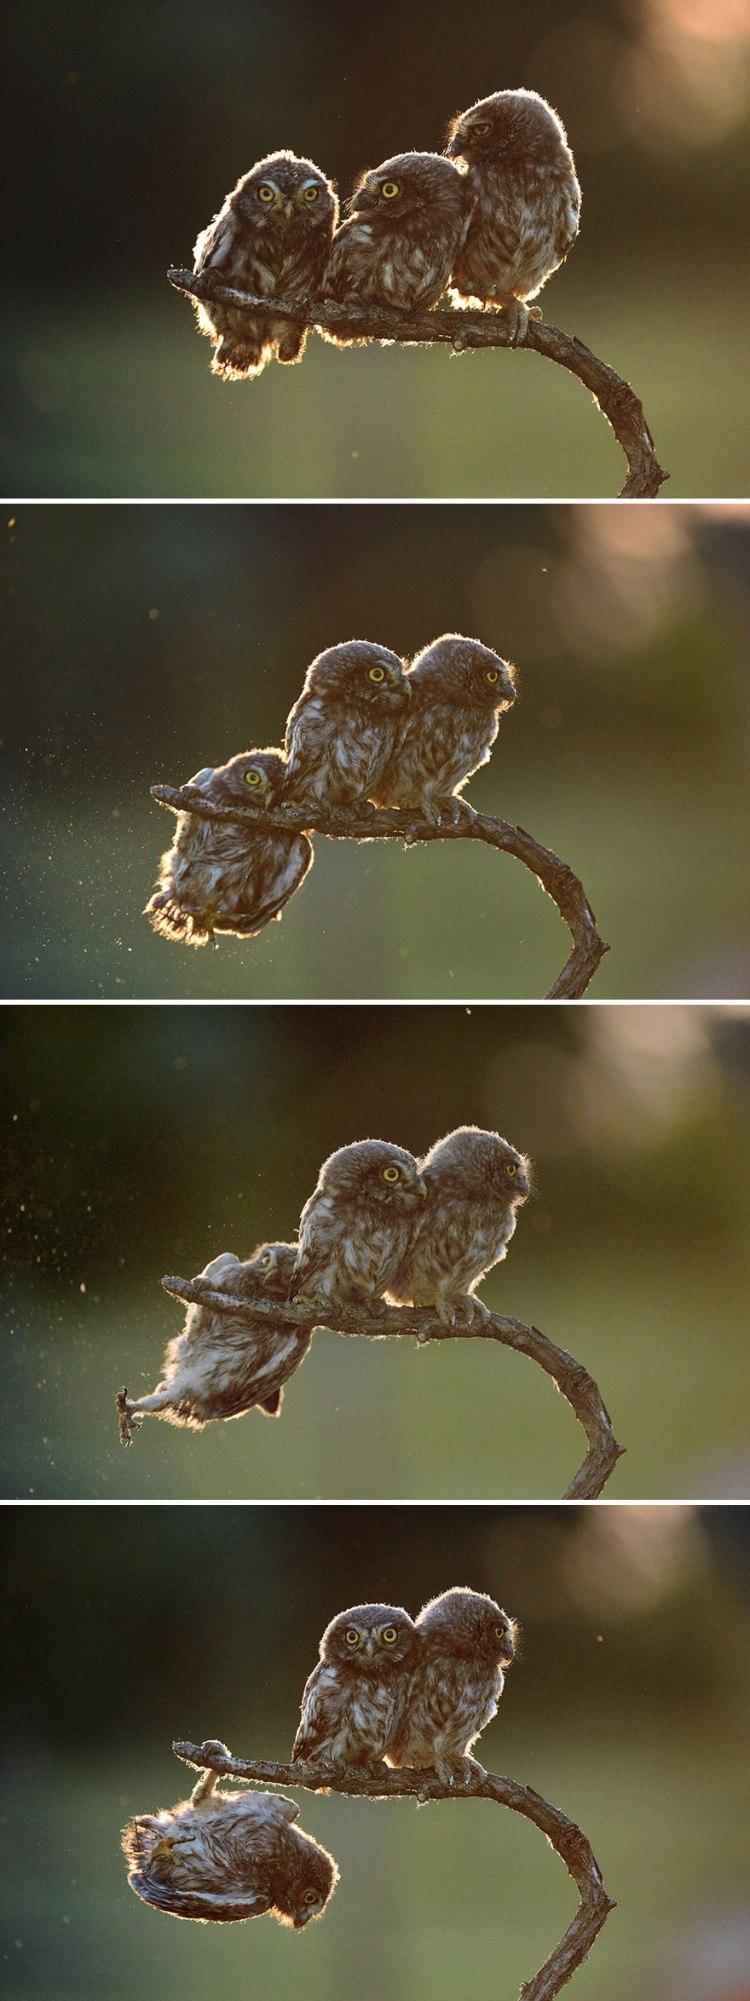 owls-1.jpg